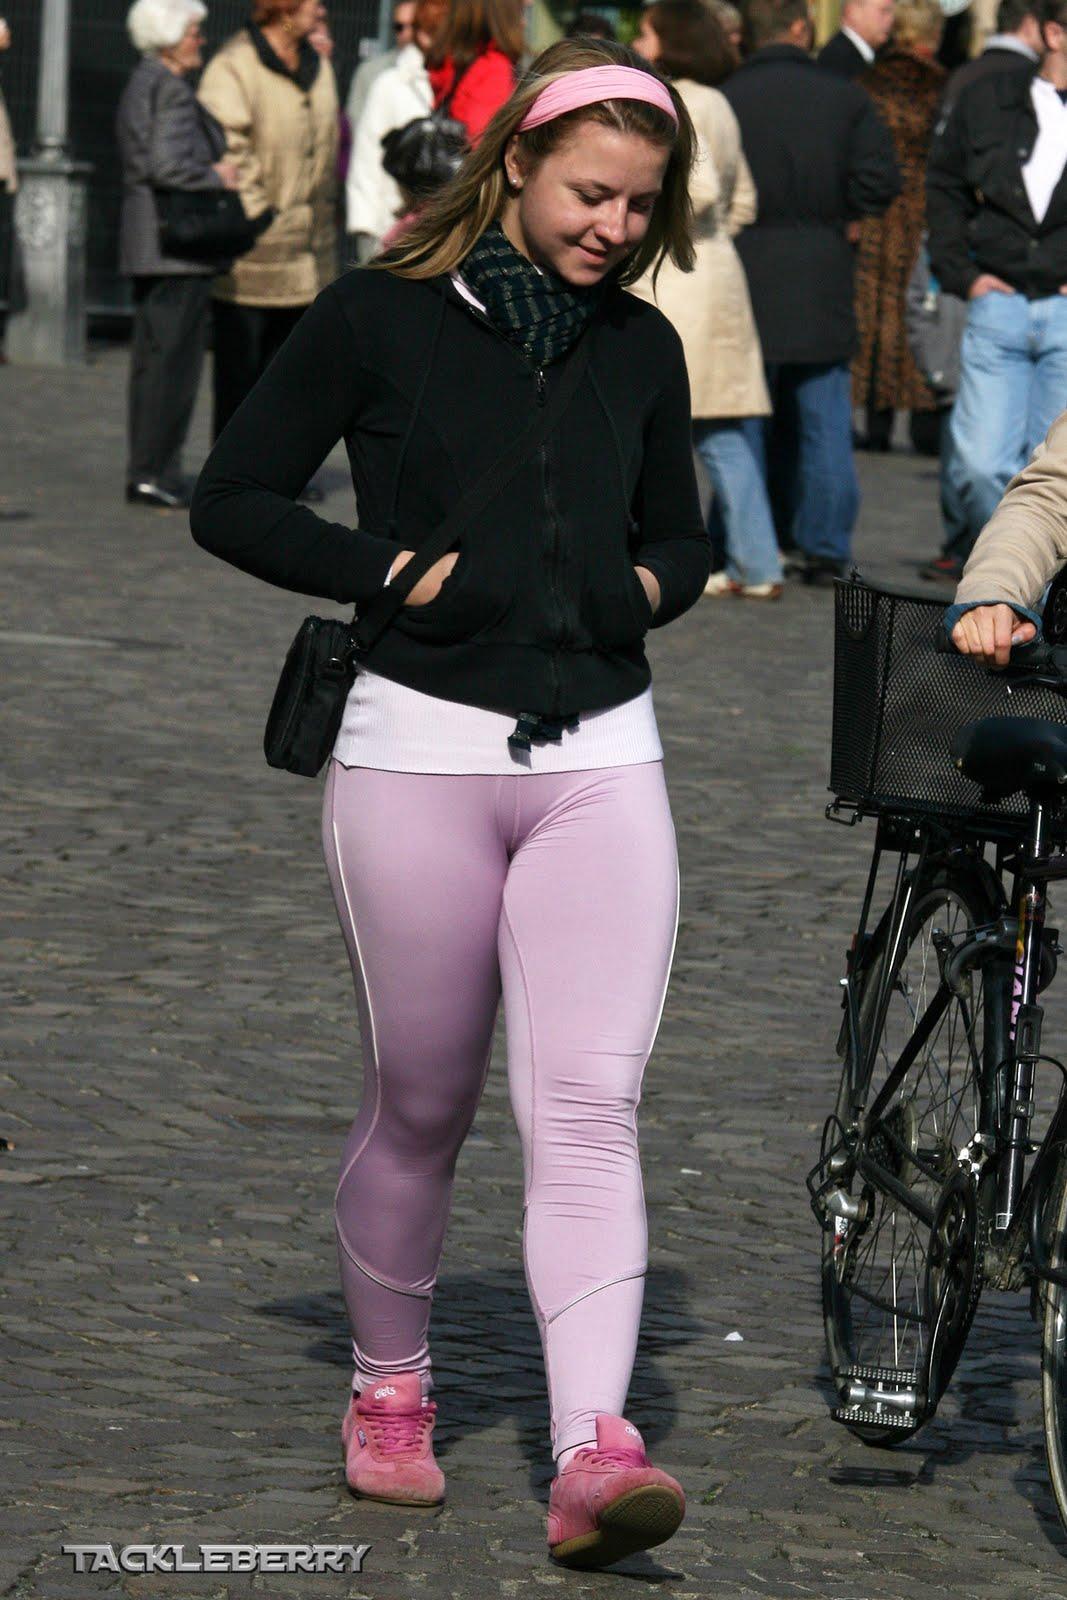 Jovencita nalgona en jeans prueba - 5 1